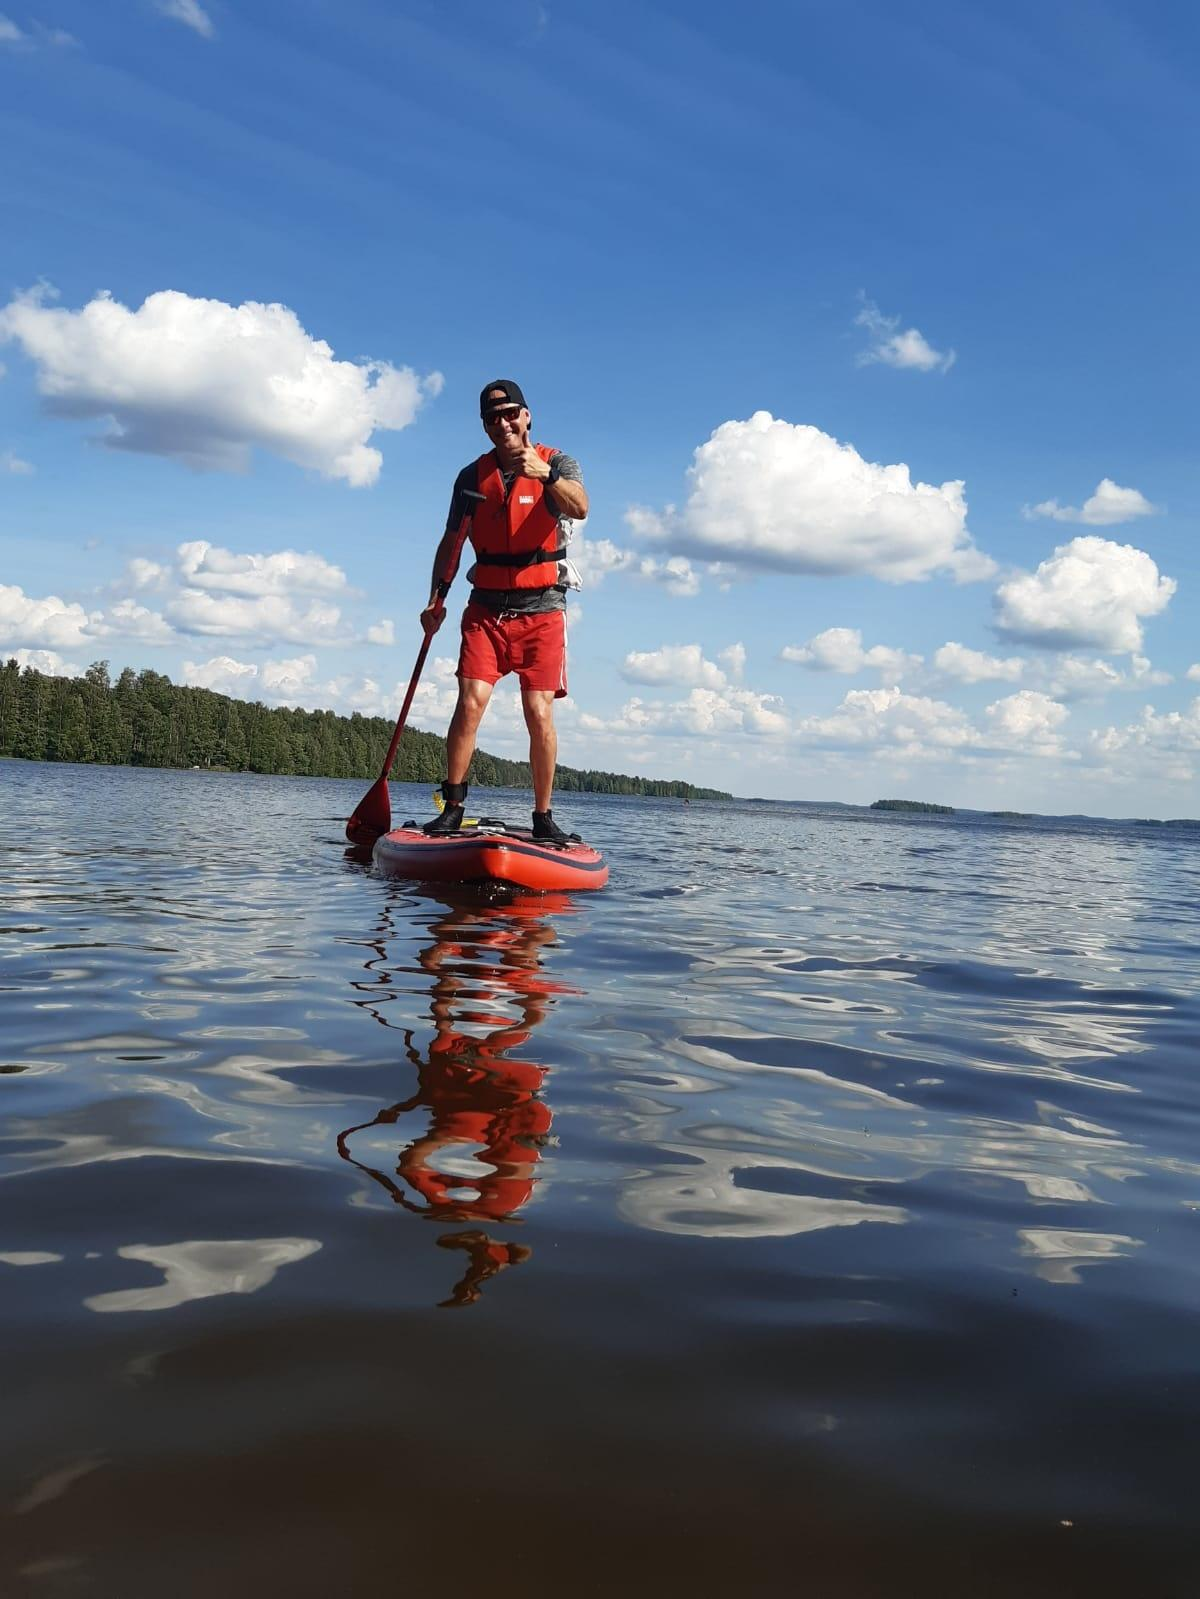 Mies suppilaudalla järvellä